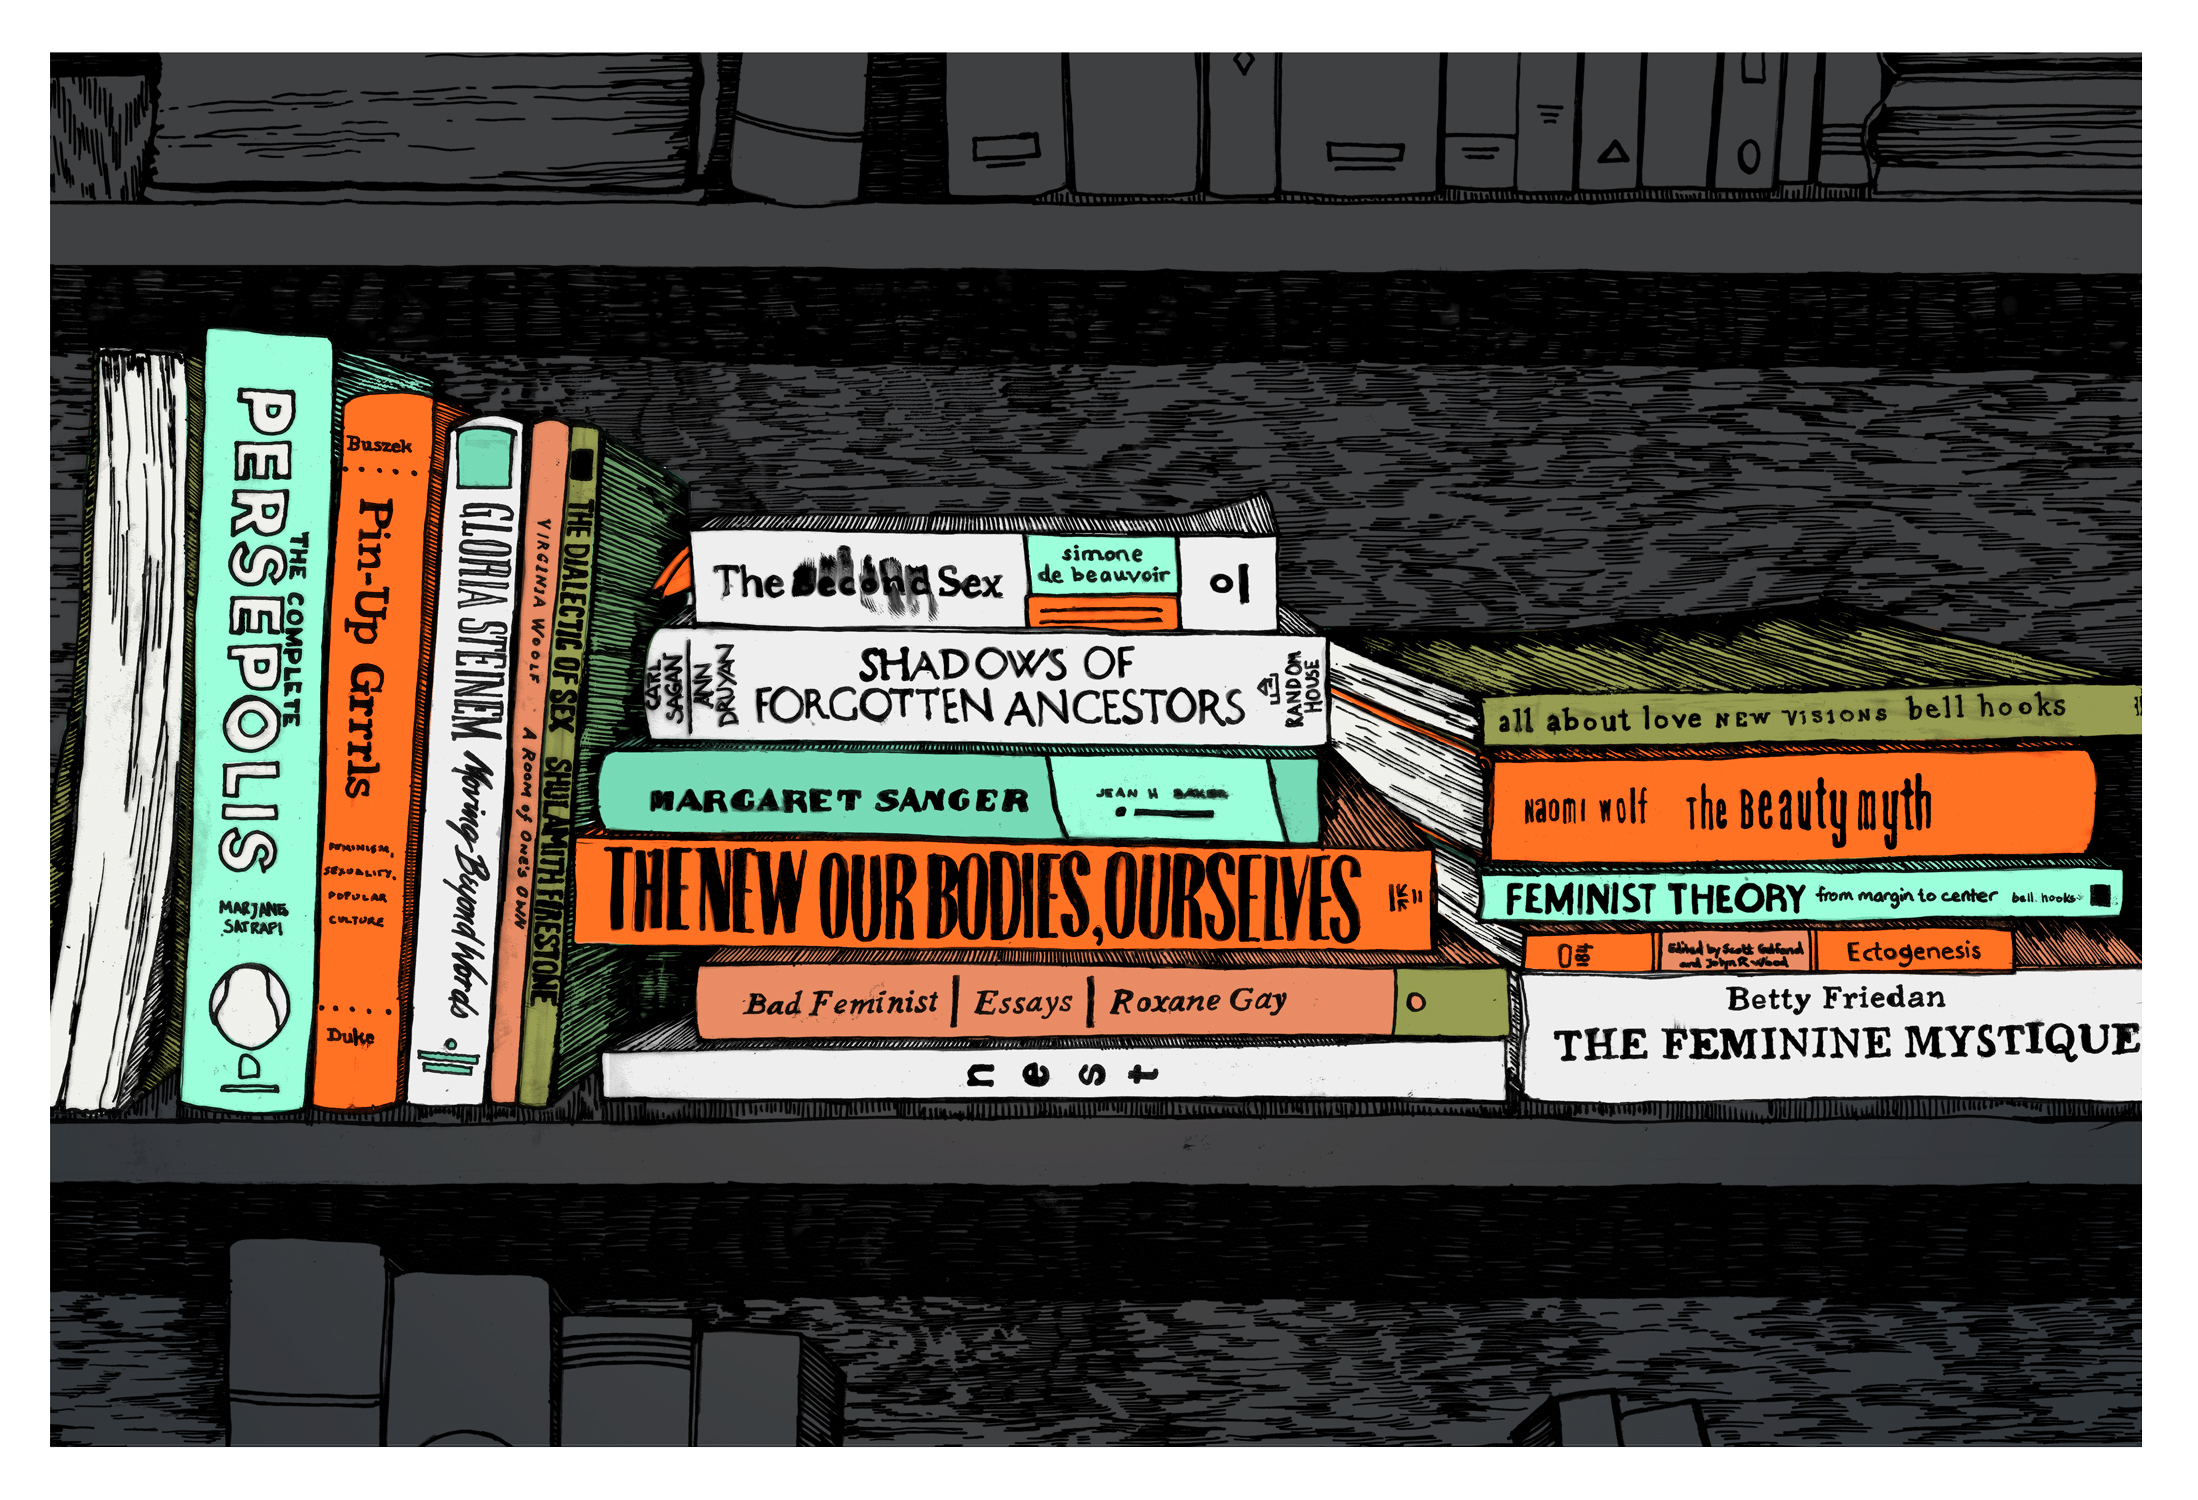 An artists impression of feminist books on a shelf.